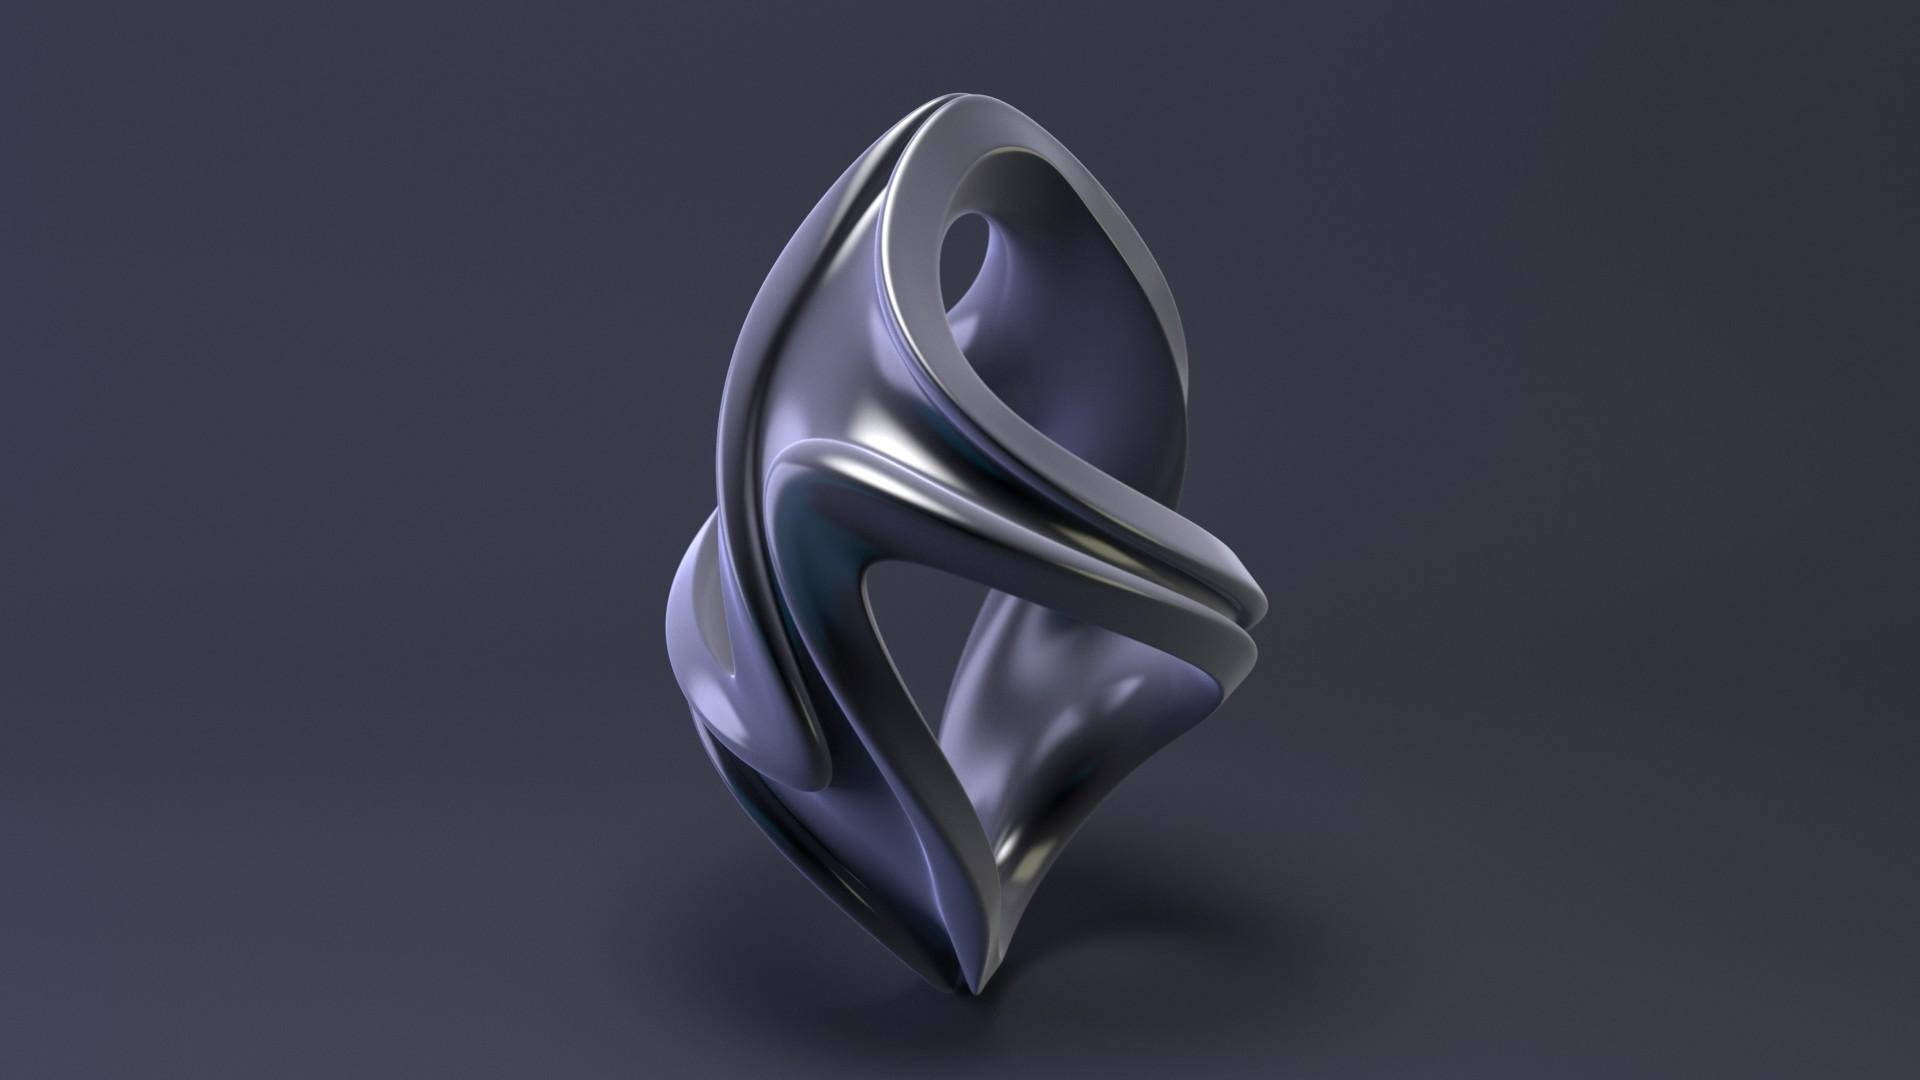 Michal mroszczak pendant